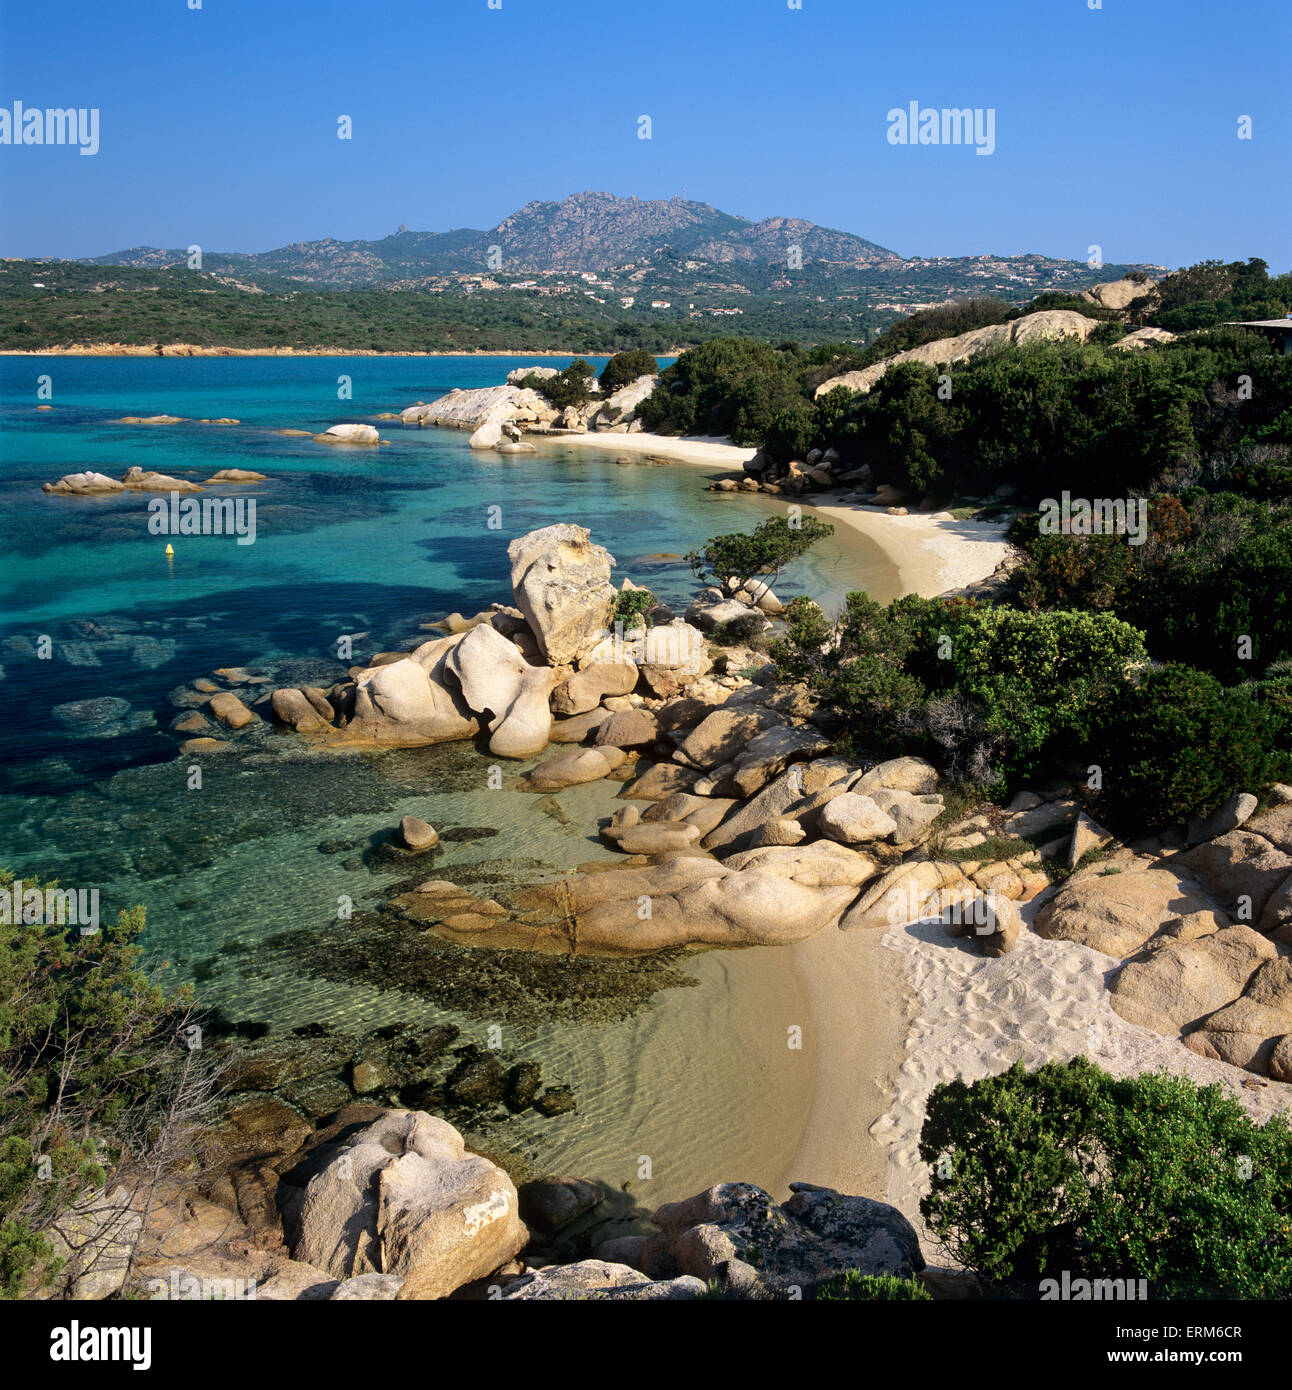 Beach view, Capo Capaccia, Costa Smeralda, Sardinia, Italy, Europe - Stock Image